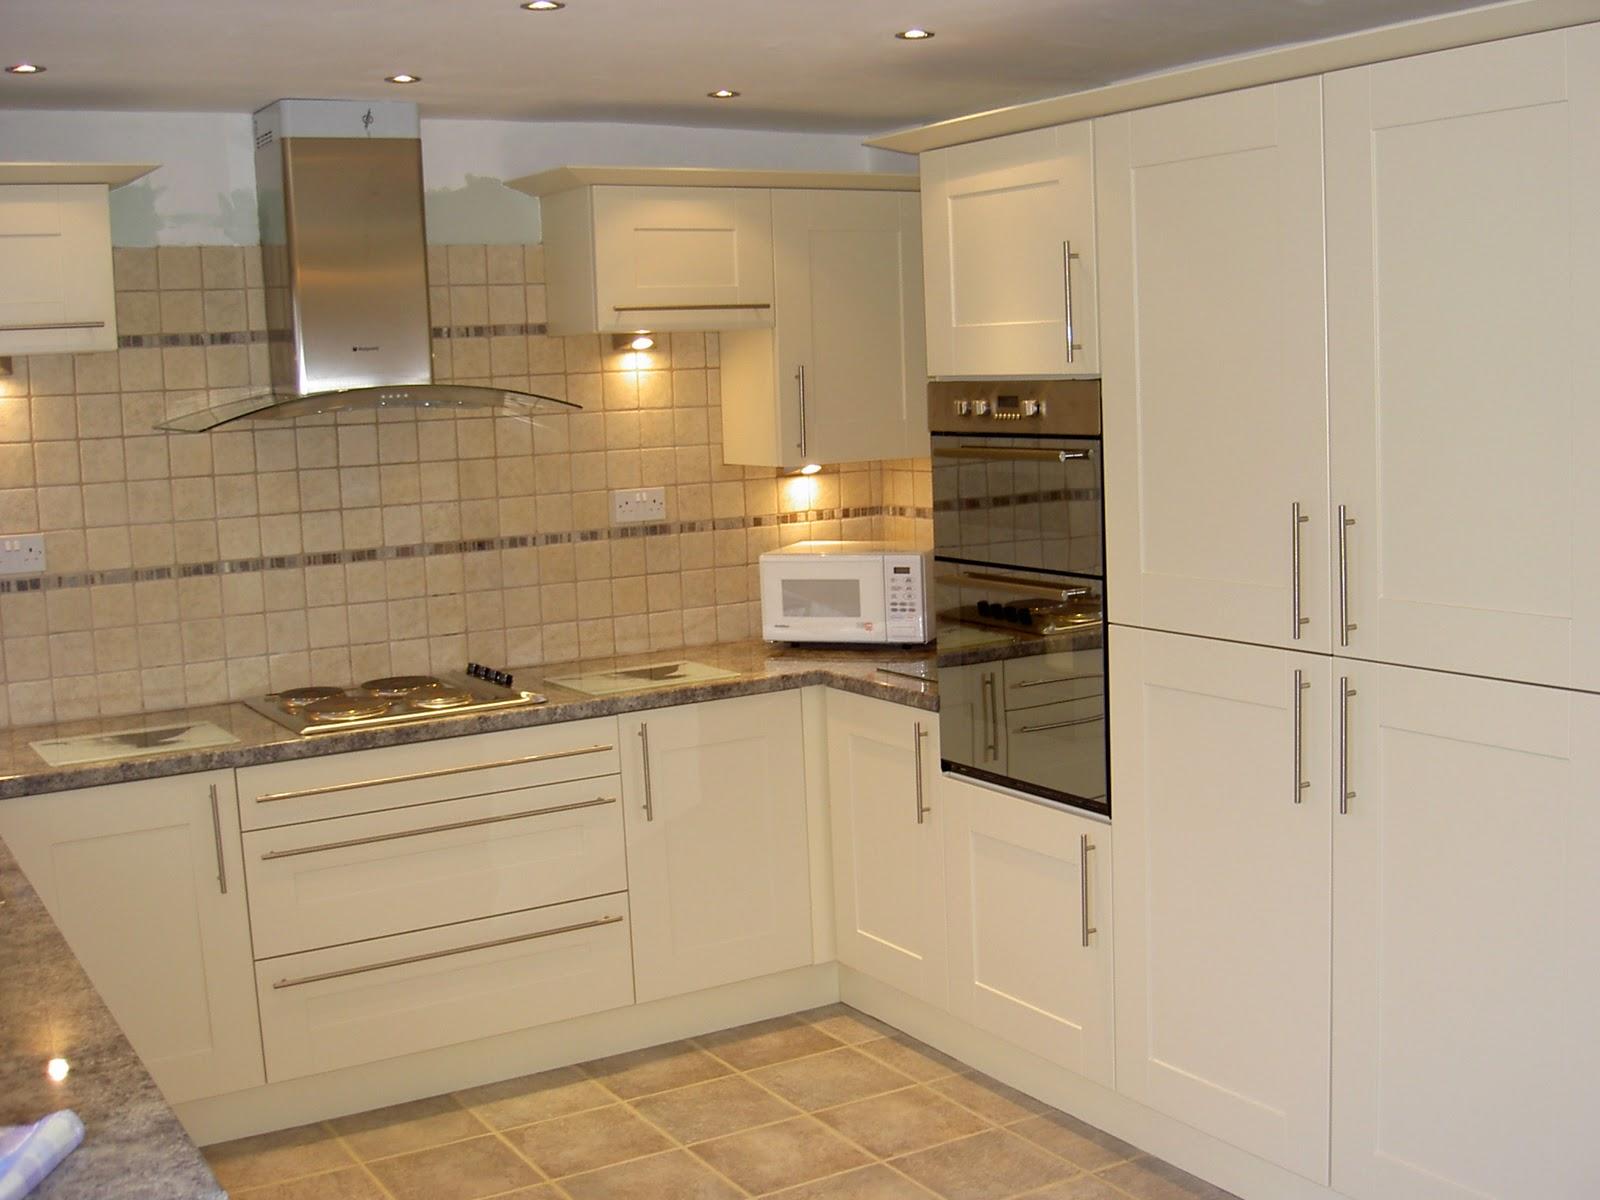 INTERIOR DESIGN CHATTER : Planning a new kitchen?